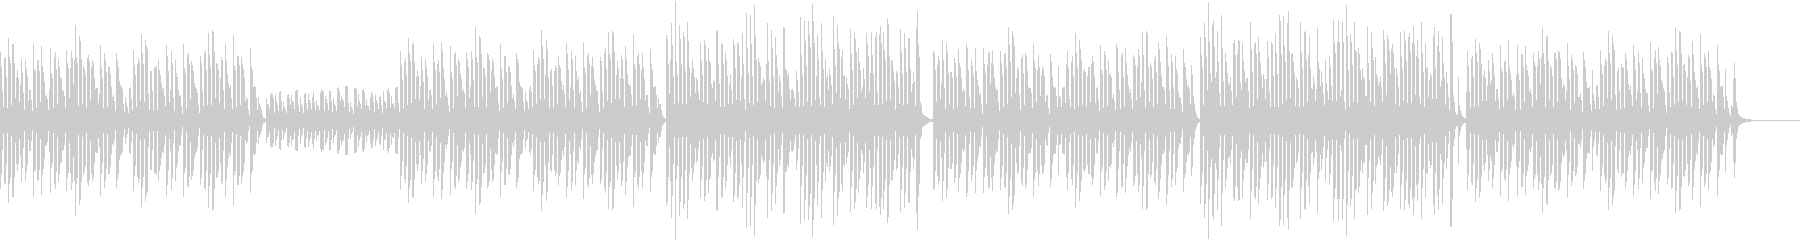 bpm076 キッズTikTok可愛い笛の未再生の波形